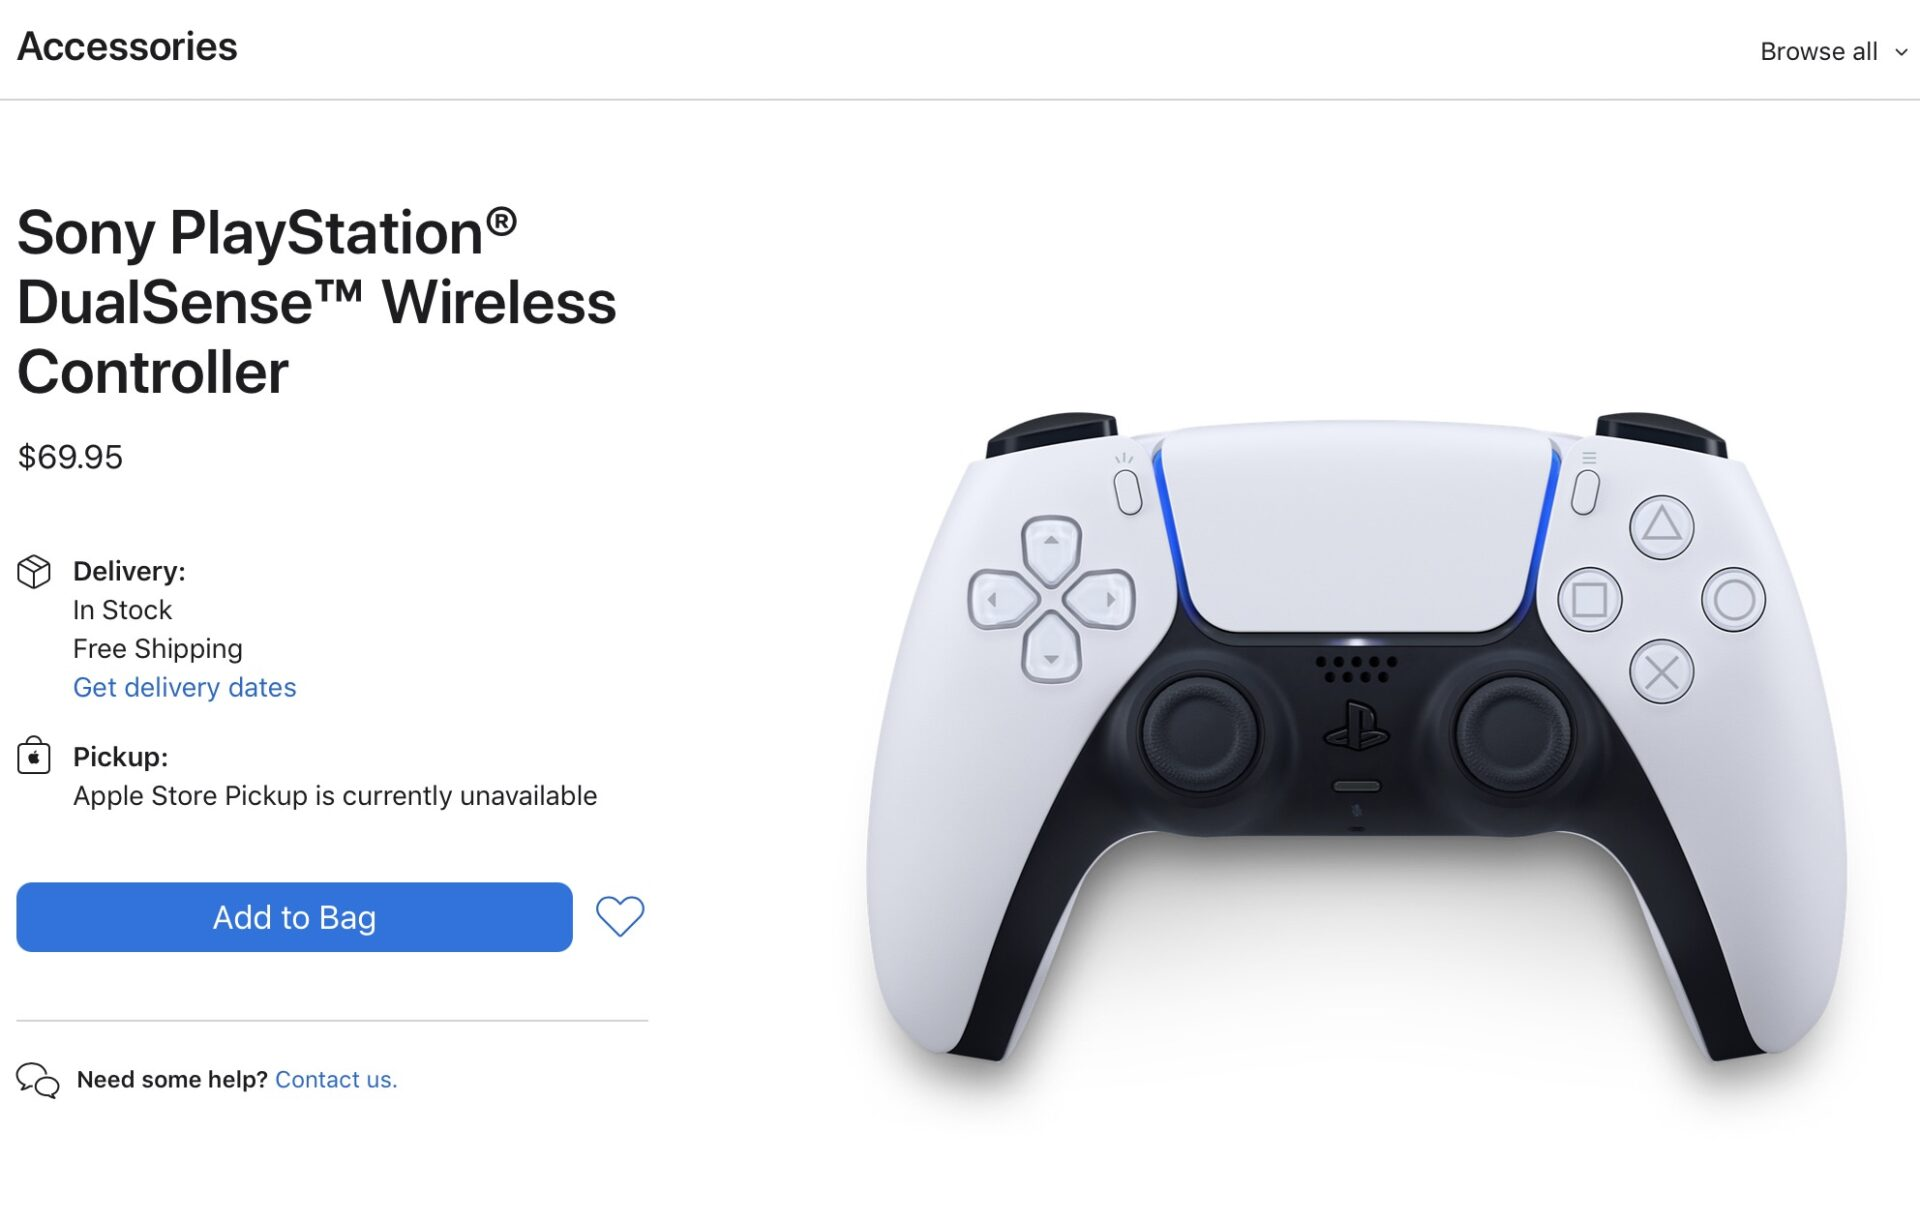 Sony PlayStation DualSense Wireless Controller